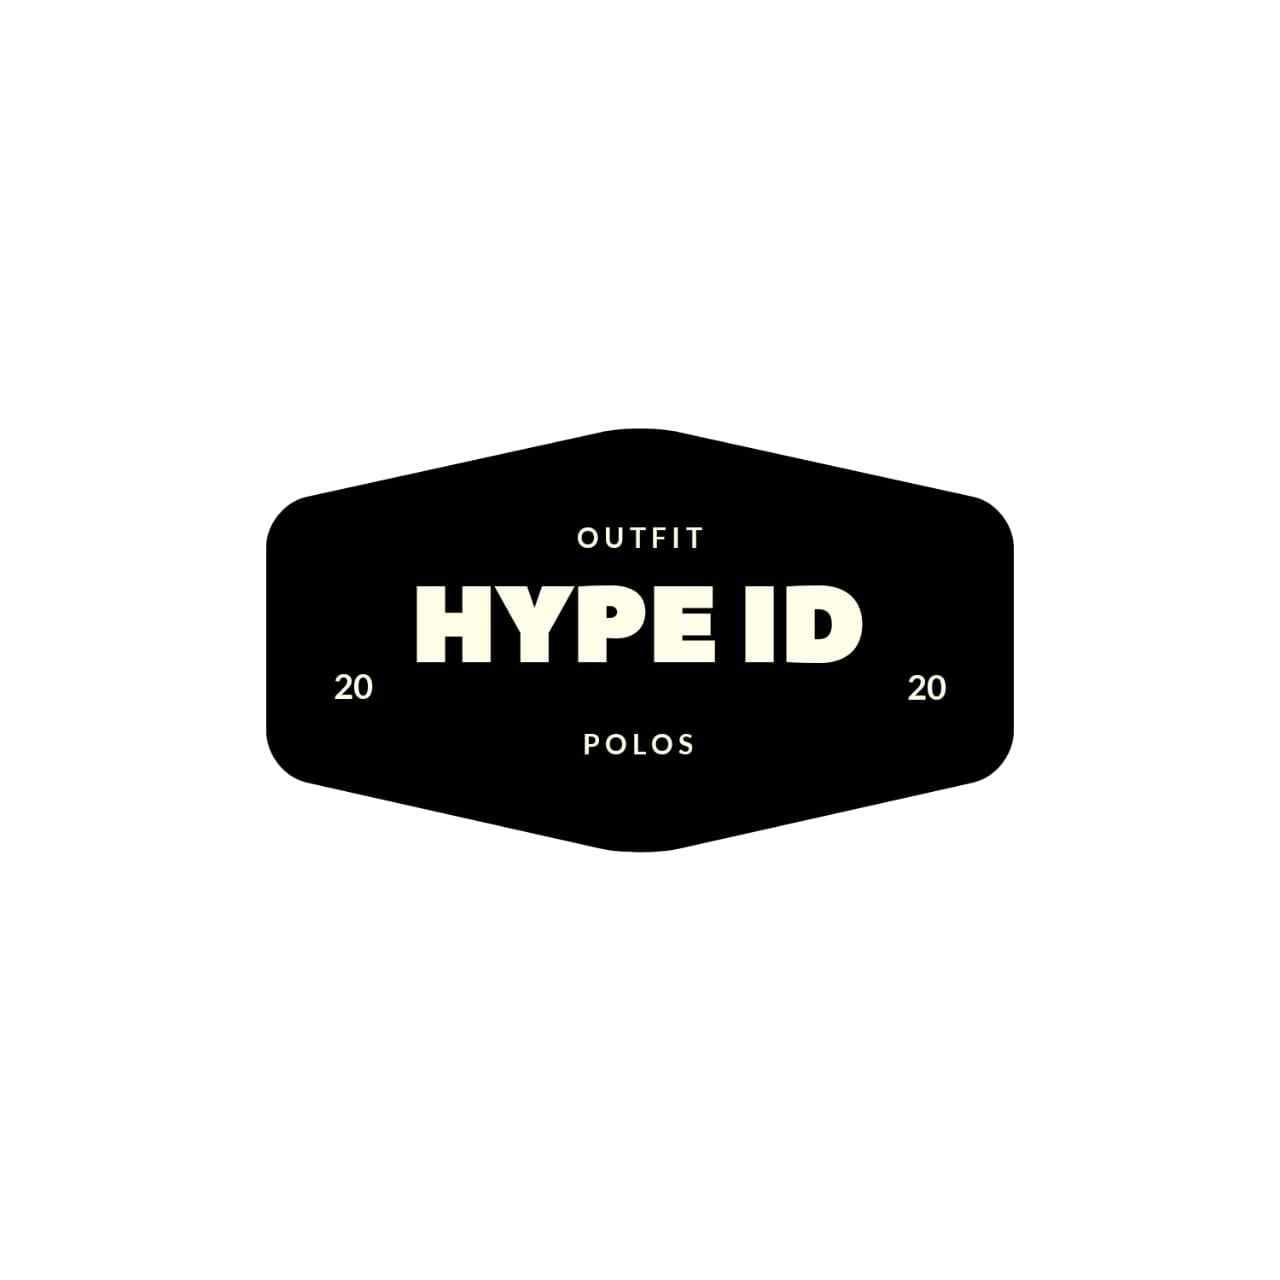 HYPE ID